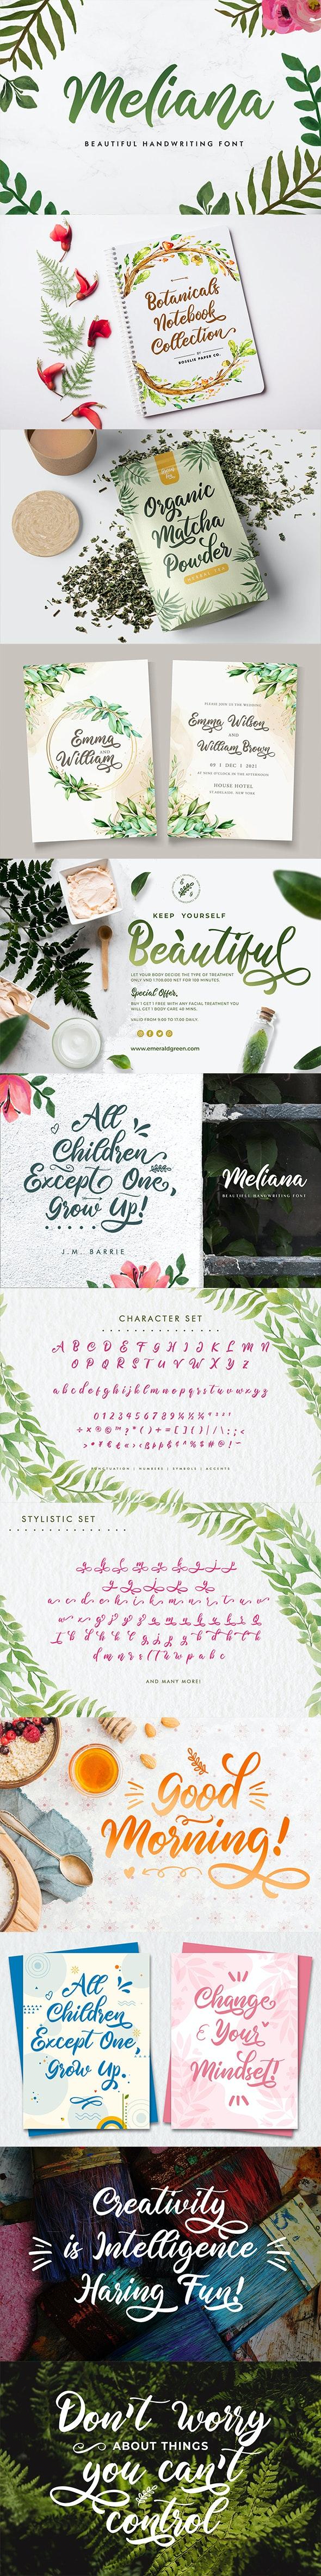 Meliana Script - Hand-writing Script